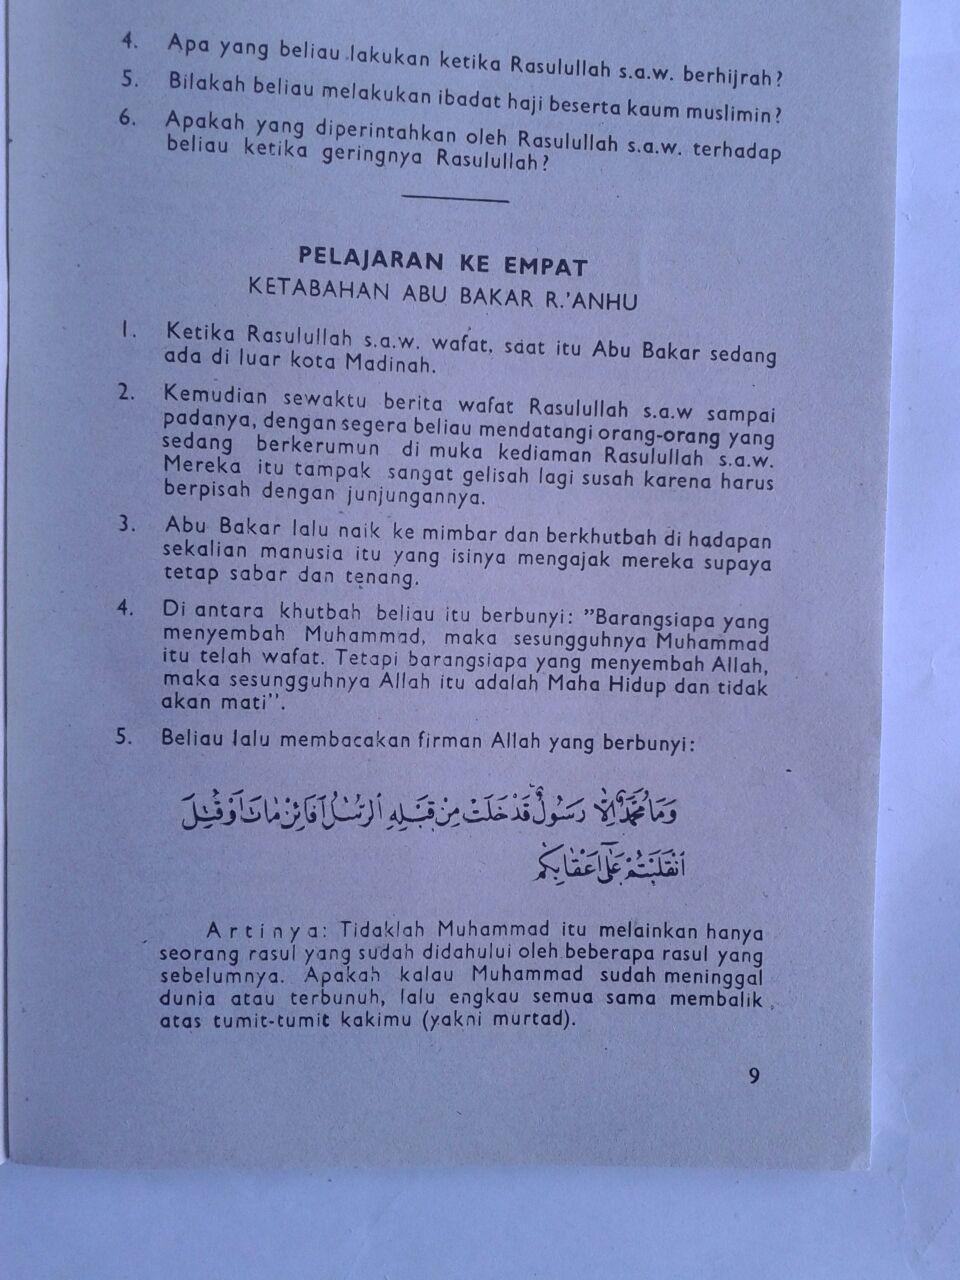 Buku Ringkasan Nurul Yaqien Sejarah Nabi Muhammad Set 3 Jilid isi 4